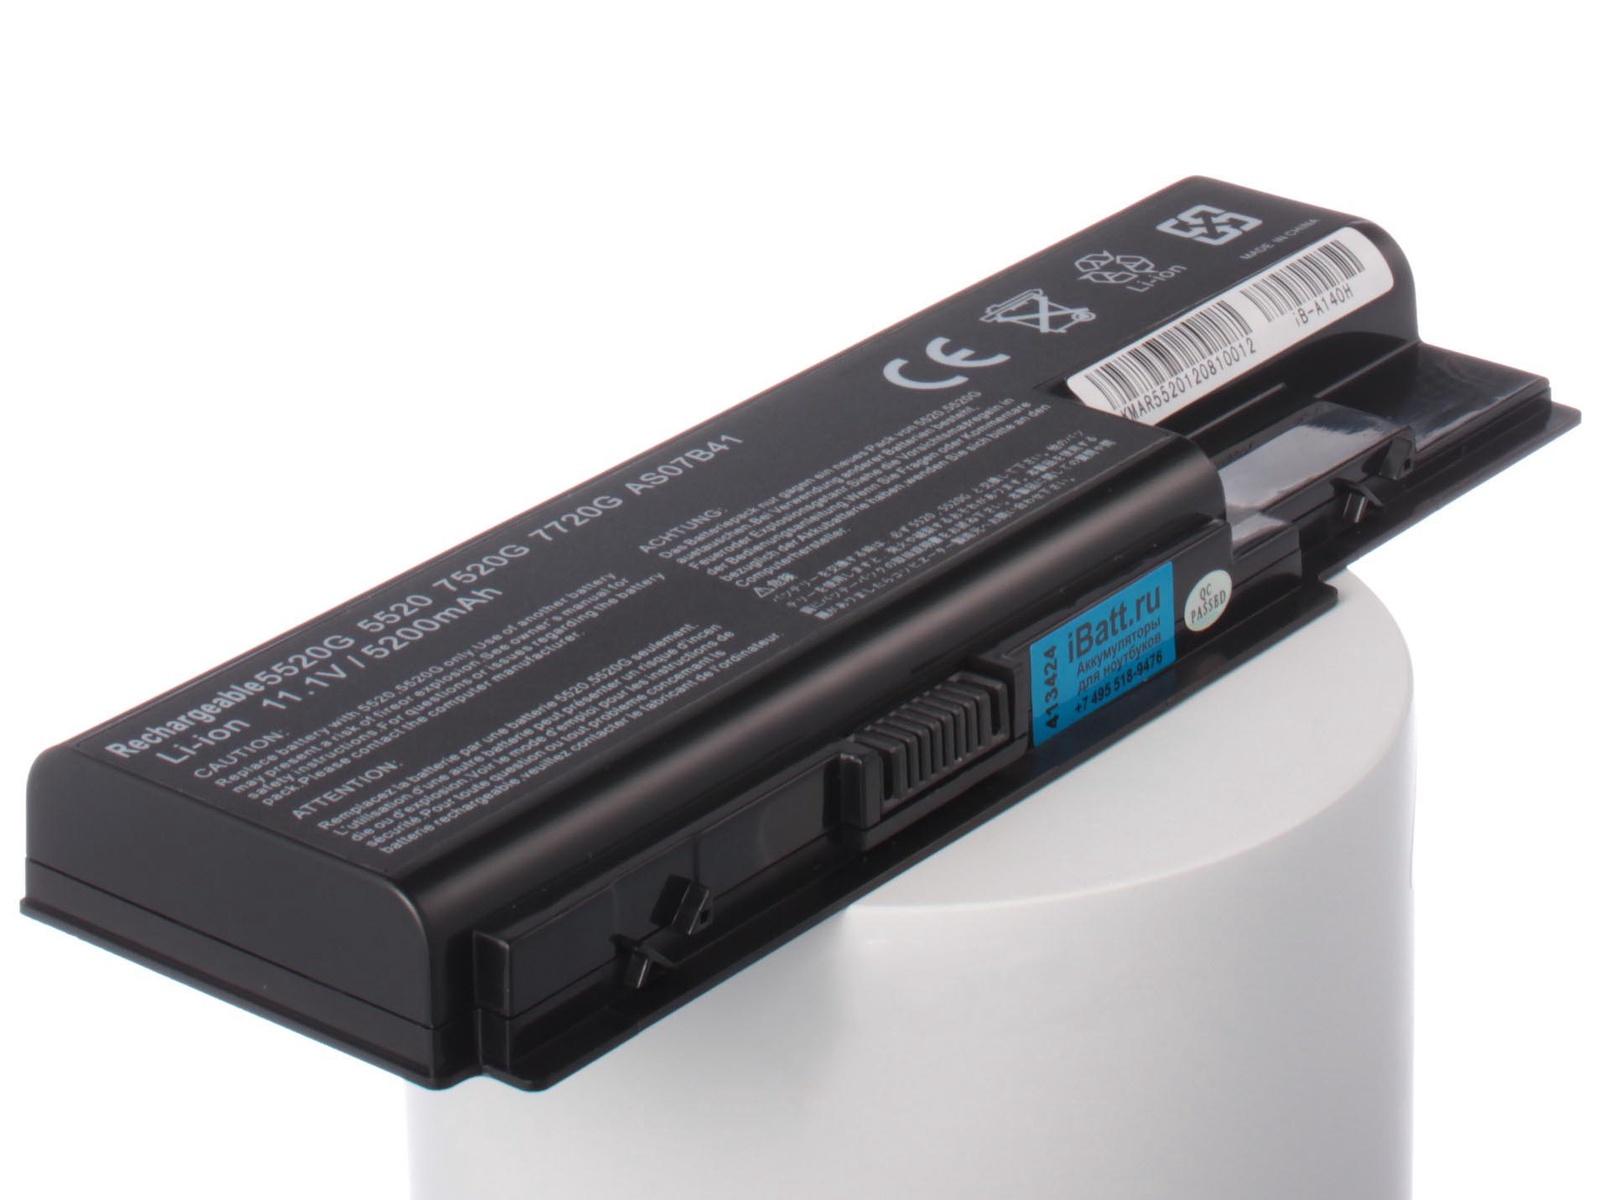 Аккумулятор для ноутбука iBatt для Acer Aspire 7720-583G25Mi, Aspire 7740G-333G25Mi, Aspire 8940, Aspire 8942G-746G64Mnbk, Extensa 7230-162G16Mi, Aspire 5330, Aspire 5920G-833G25MI, Aspire 5935G-754G50Bi, Aspire 7730ZG ноутбук acer aspire 8942g